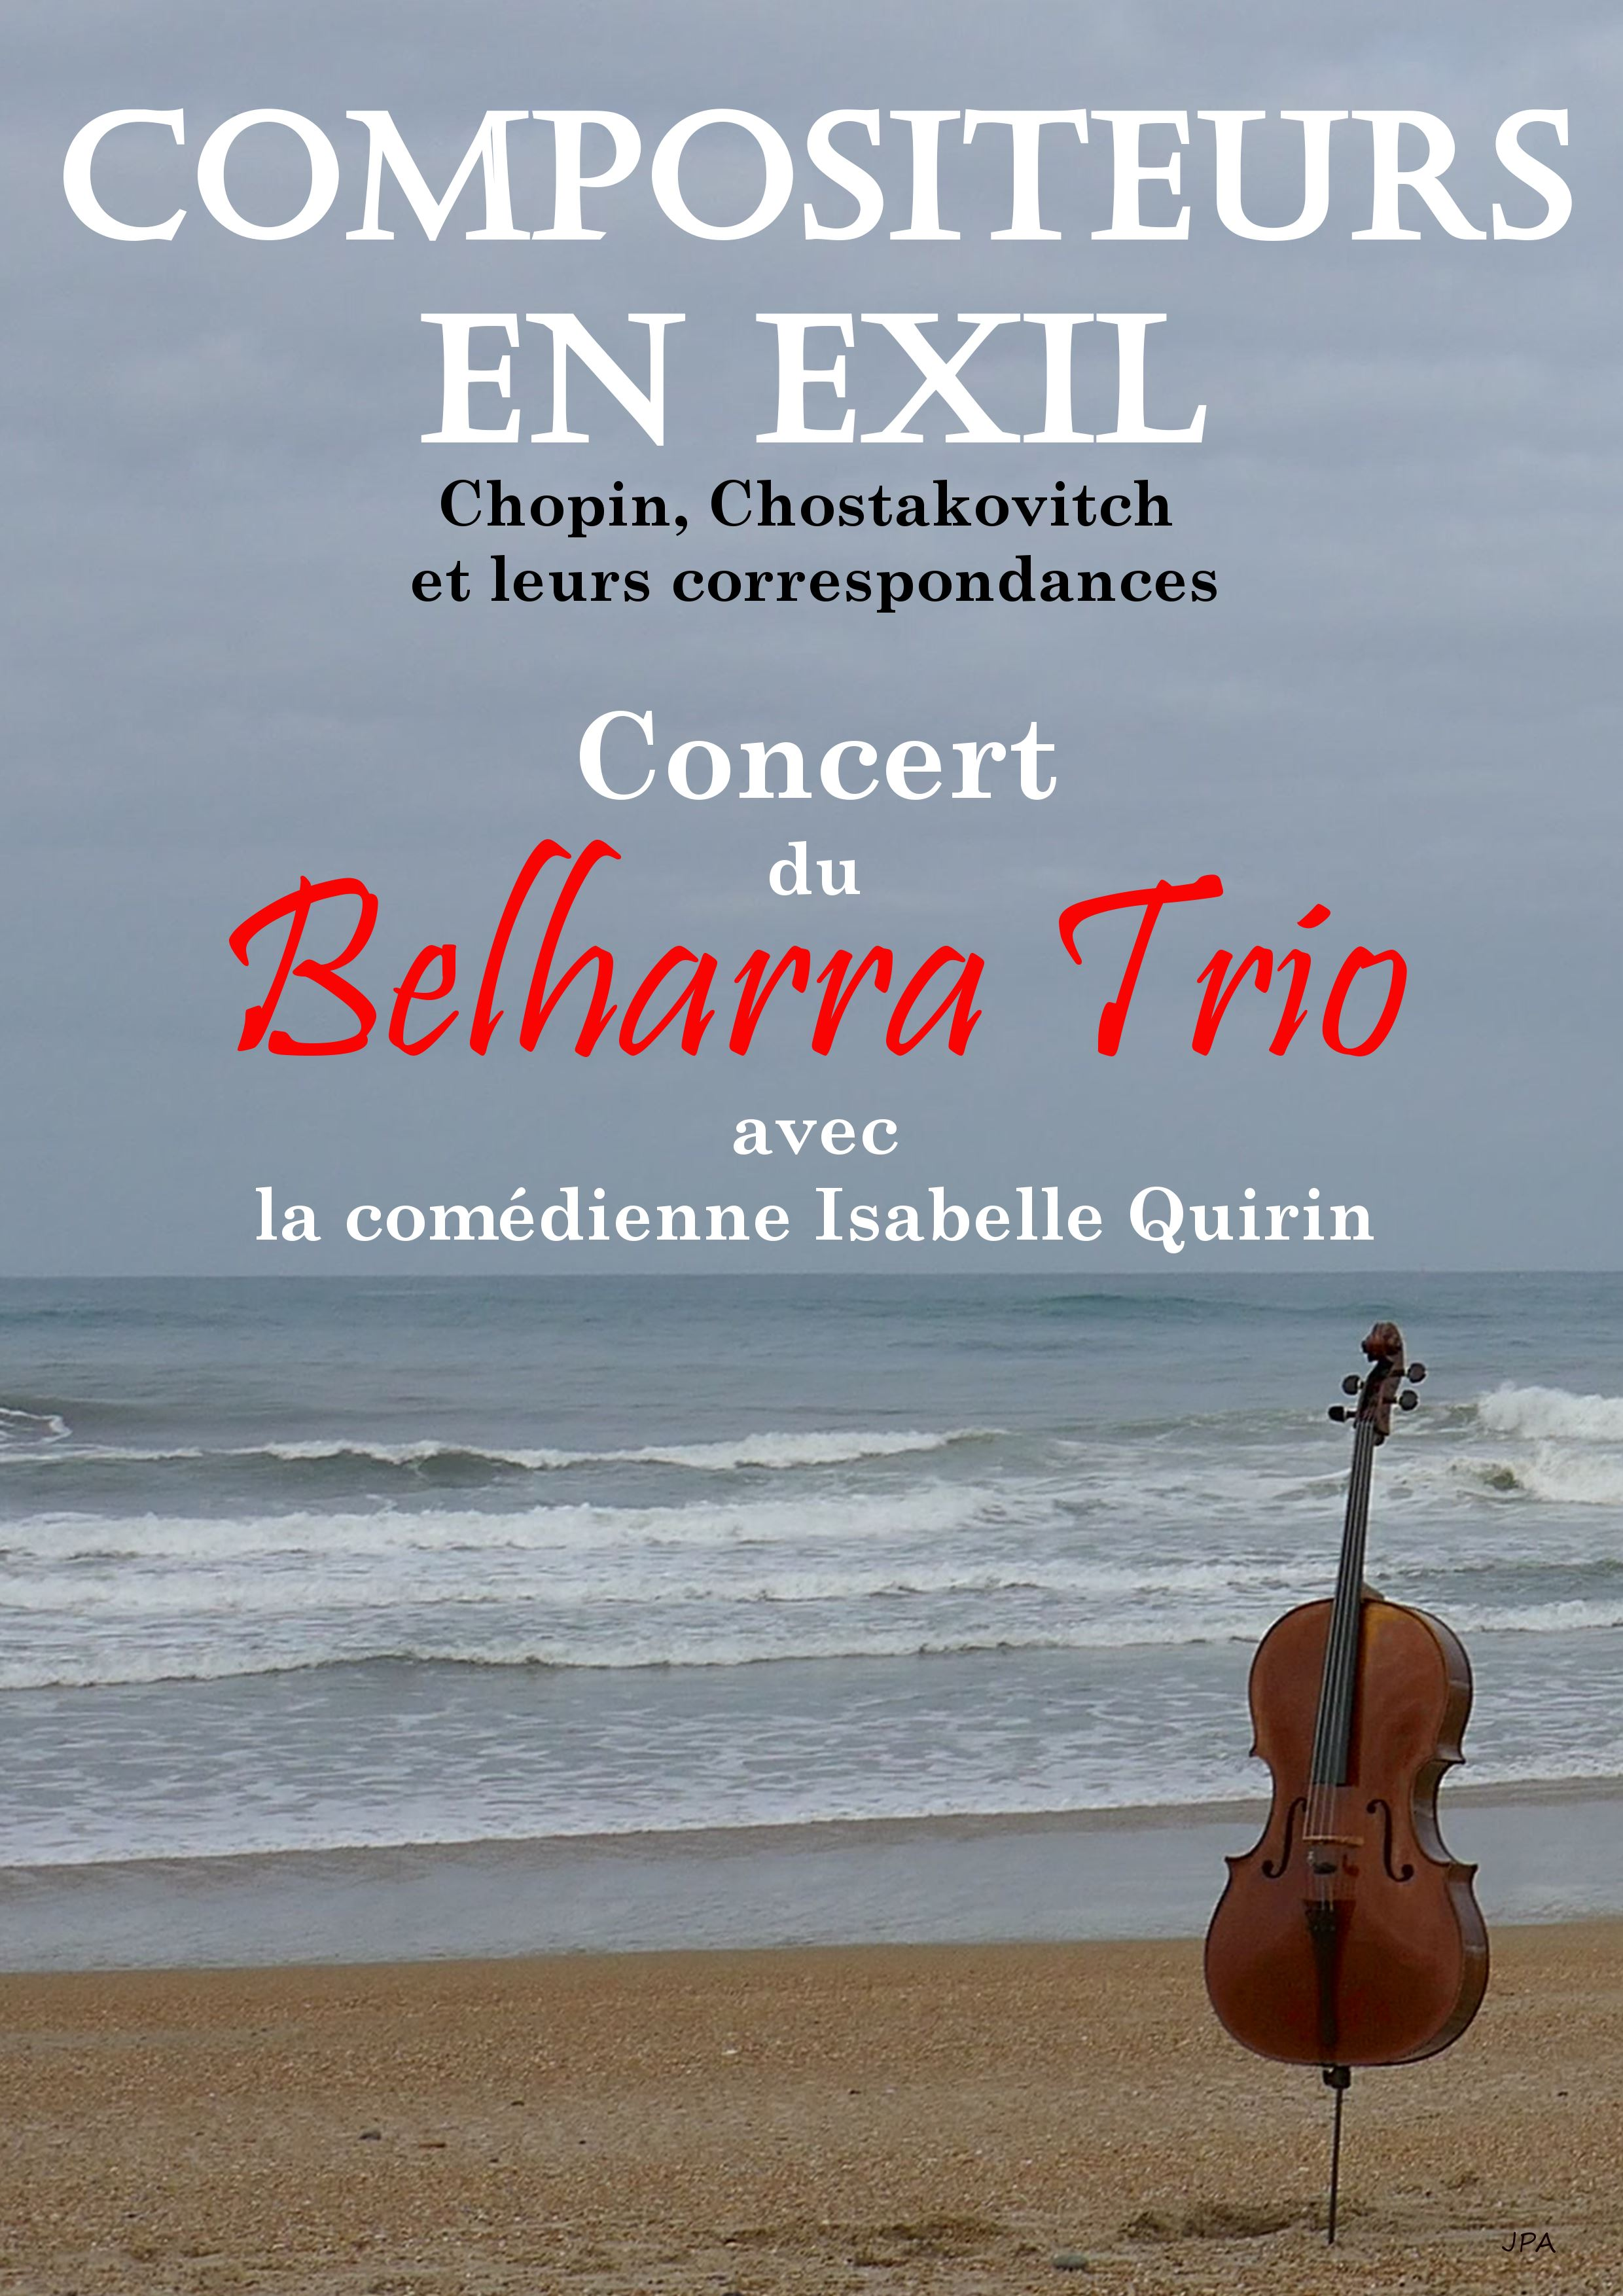 Concert Belharra Trio Mardi 24 Avril 2018